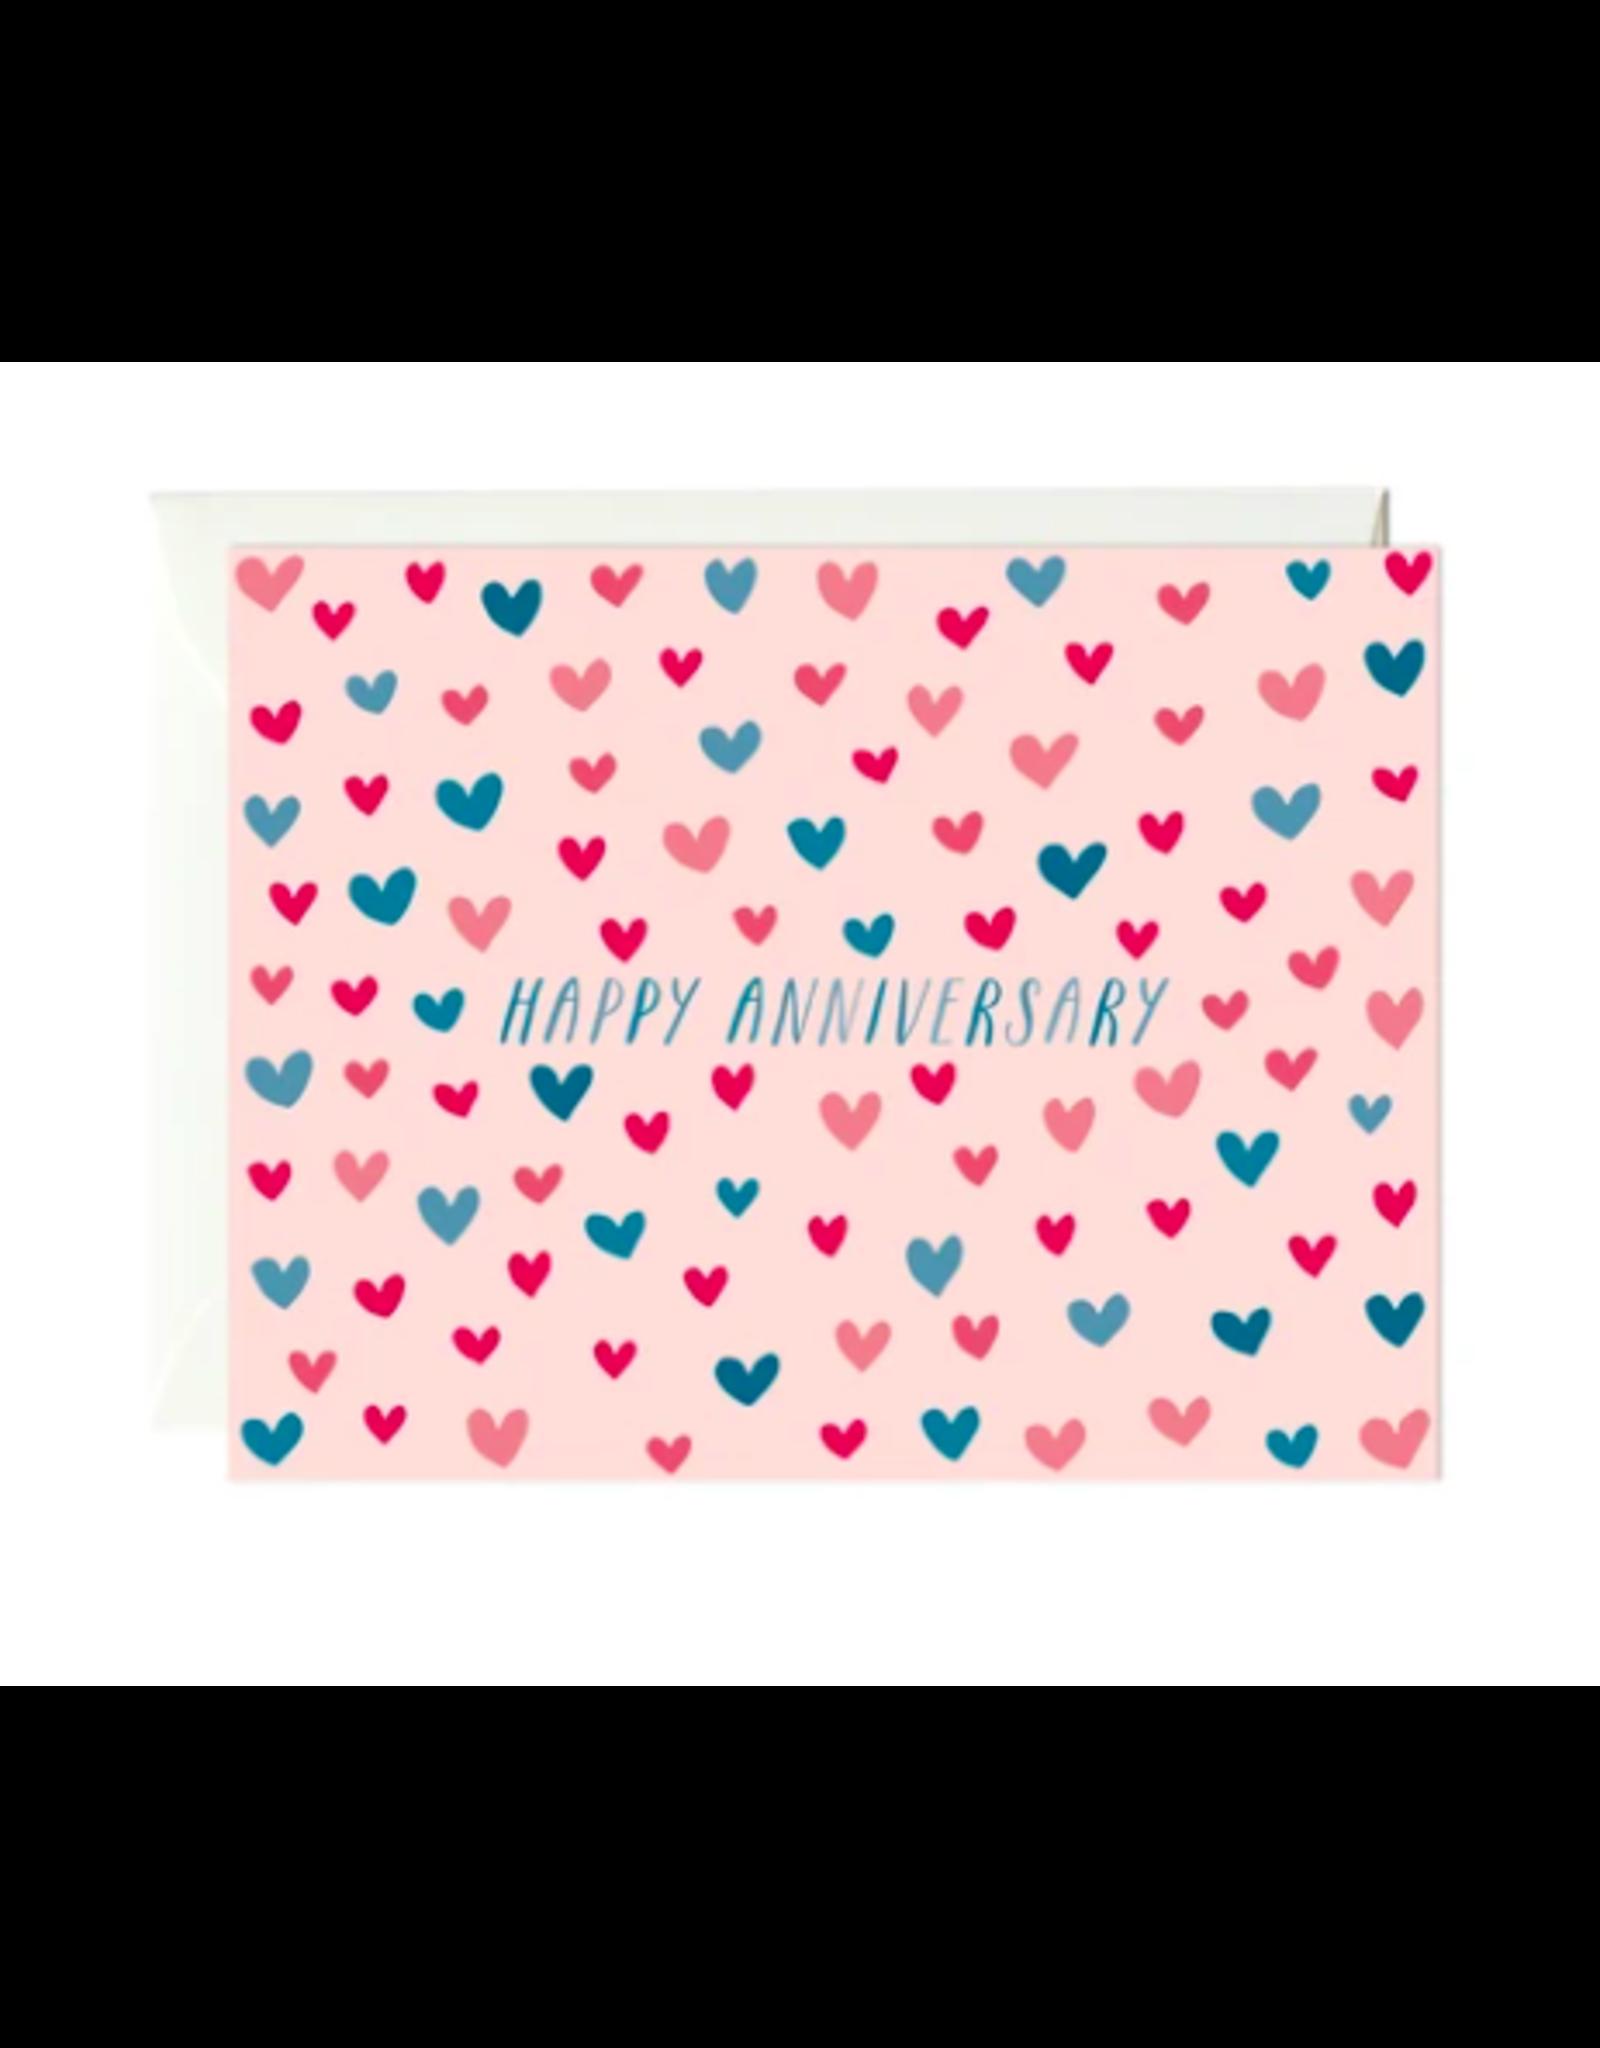 Paula and Waffle Annniversary Hearts Card